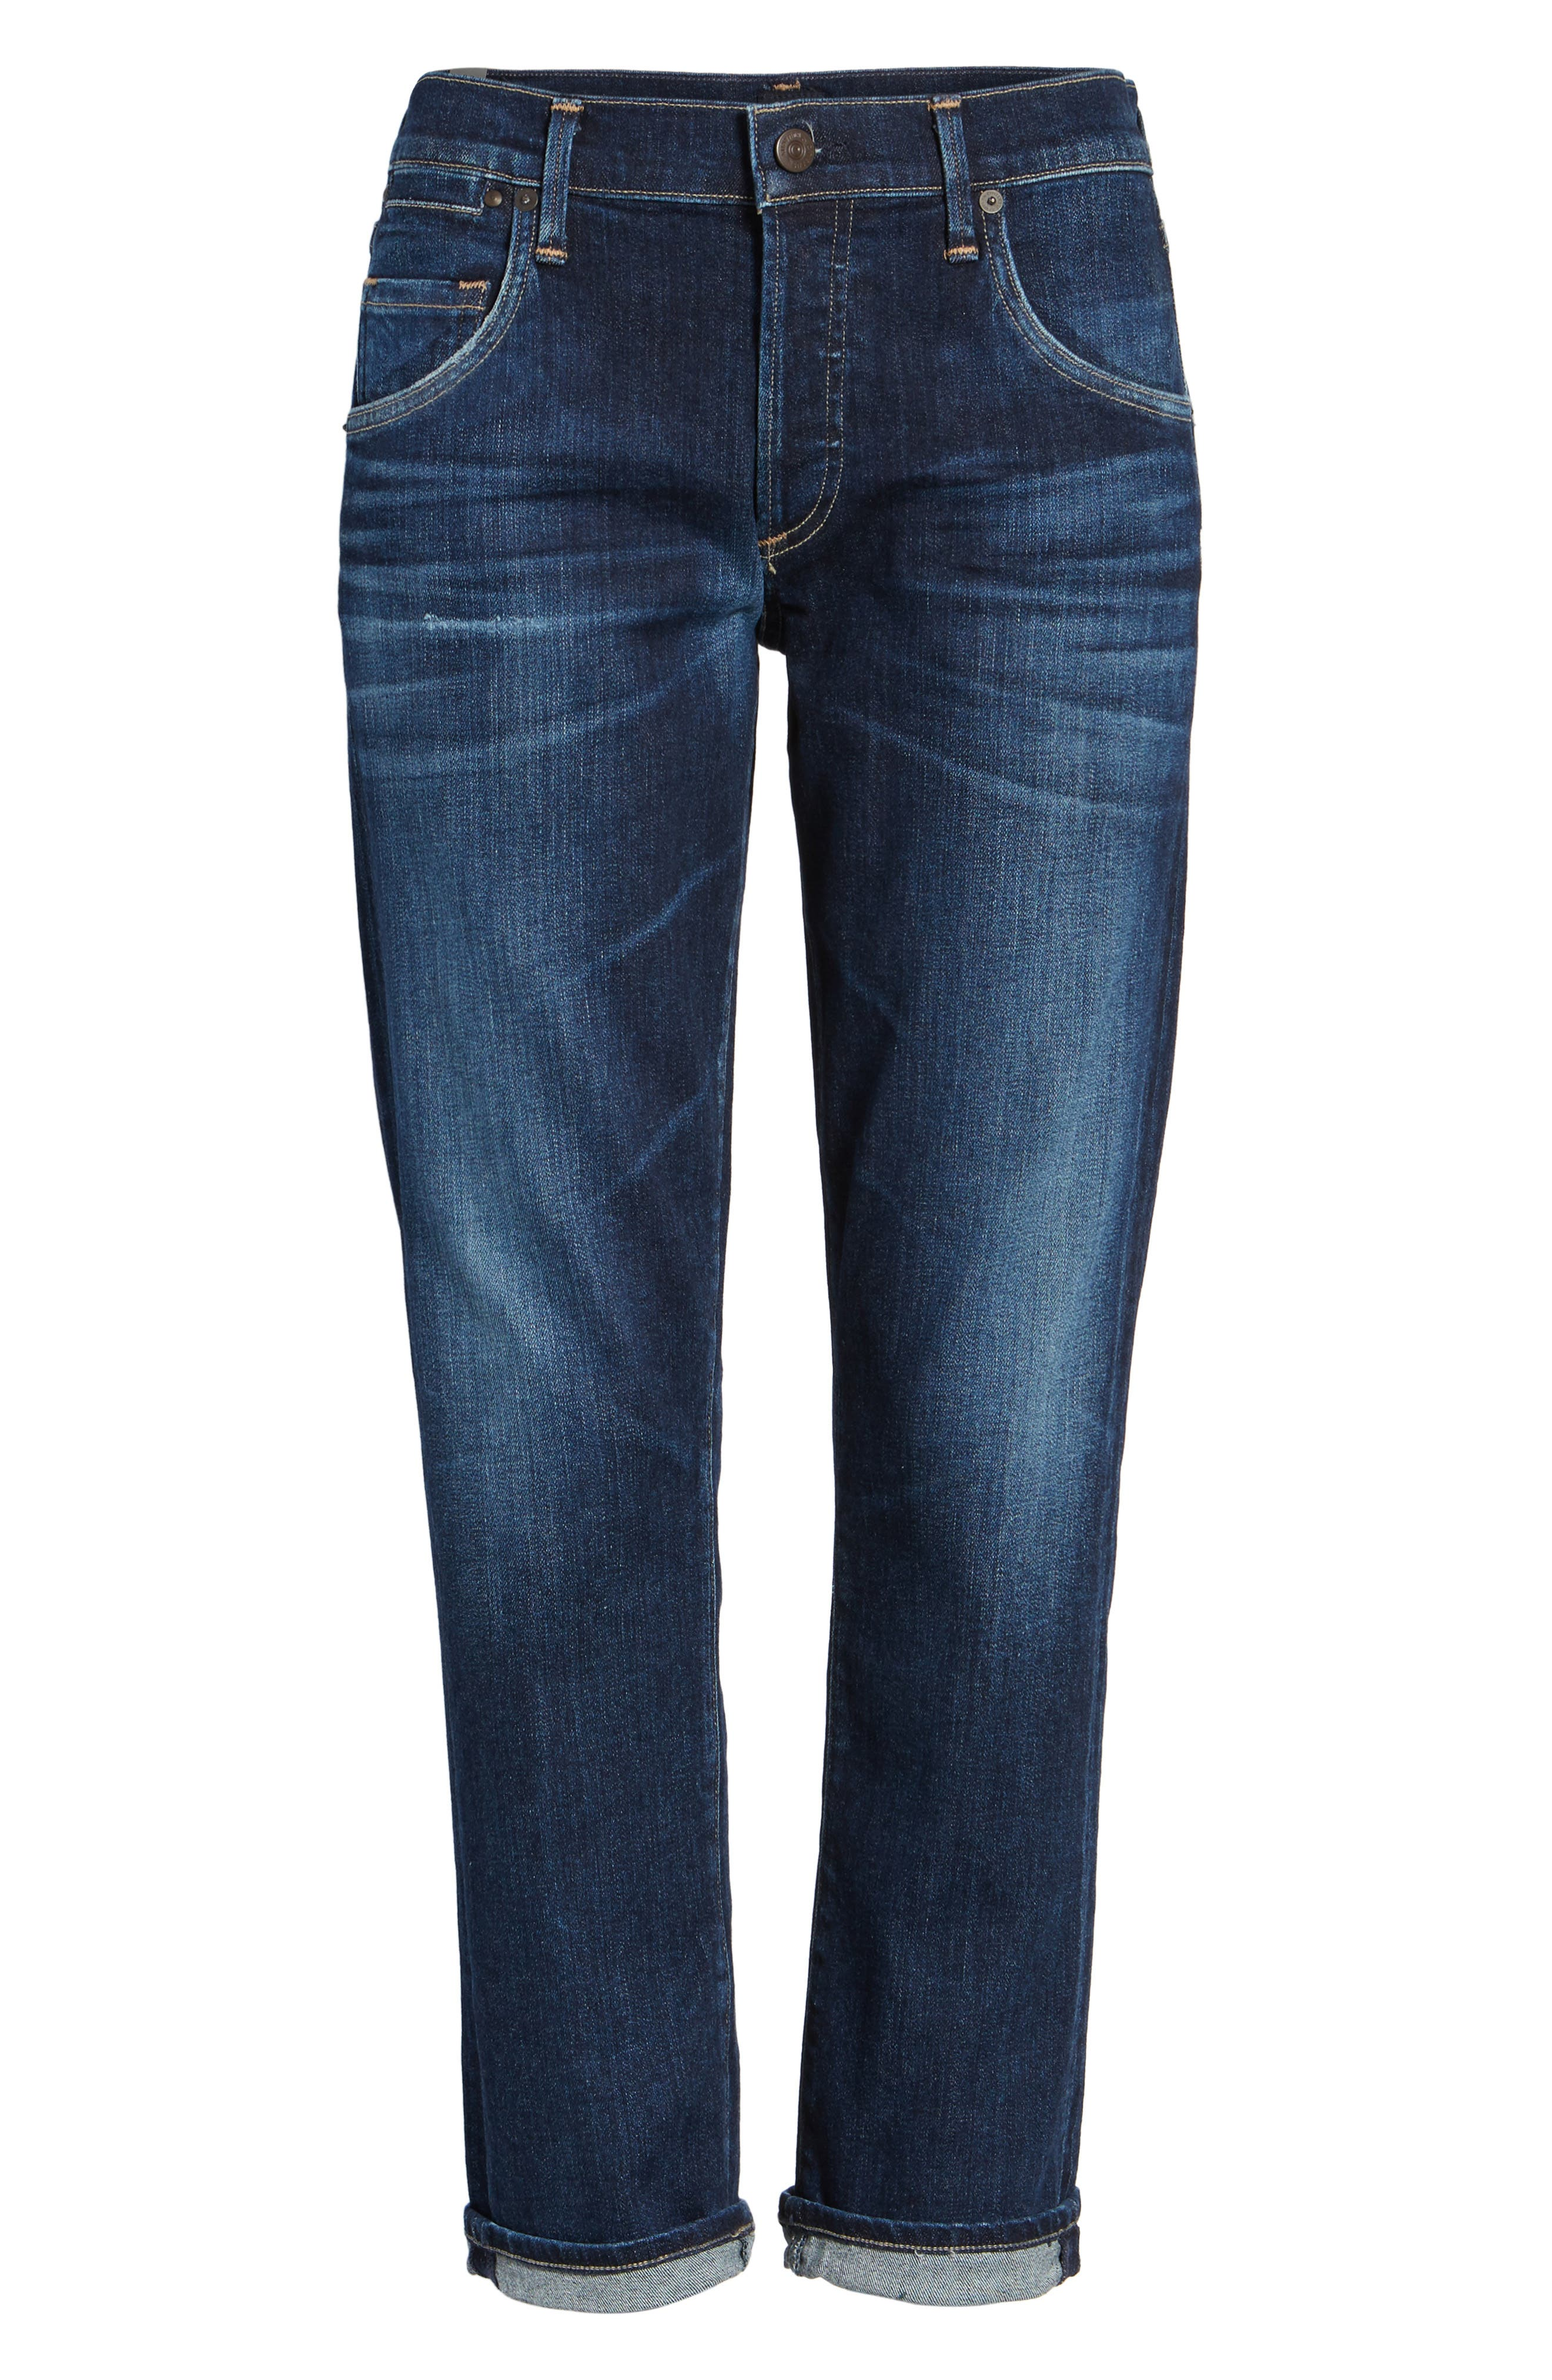 CITIZENS OF HUMANITY Emerson Slim Boyfriend Jeans, Main, color, BLUE RIDGE